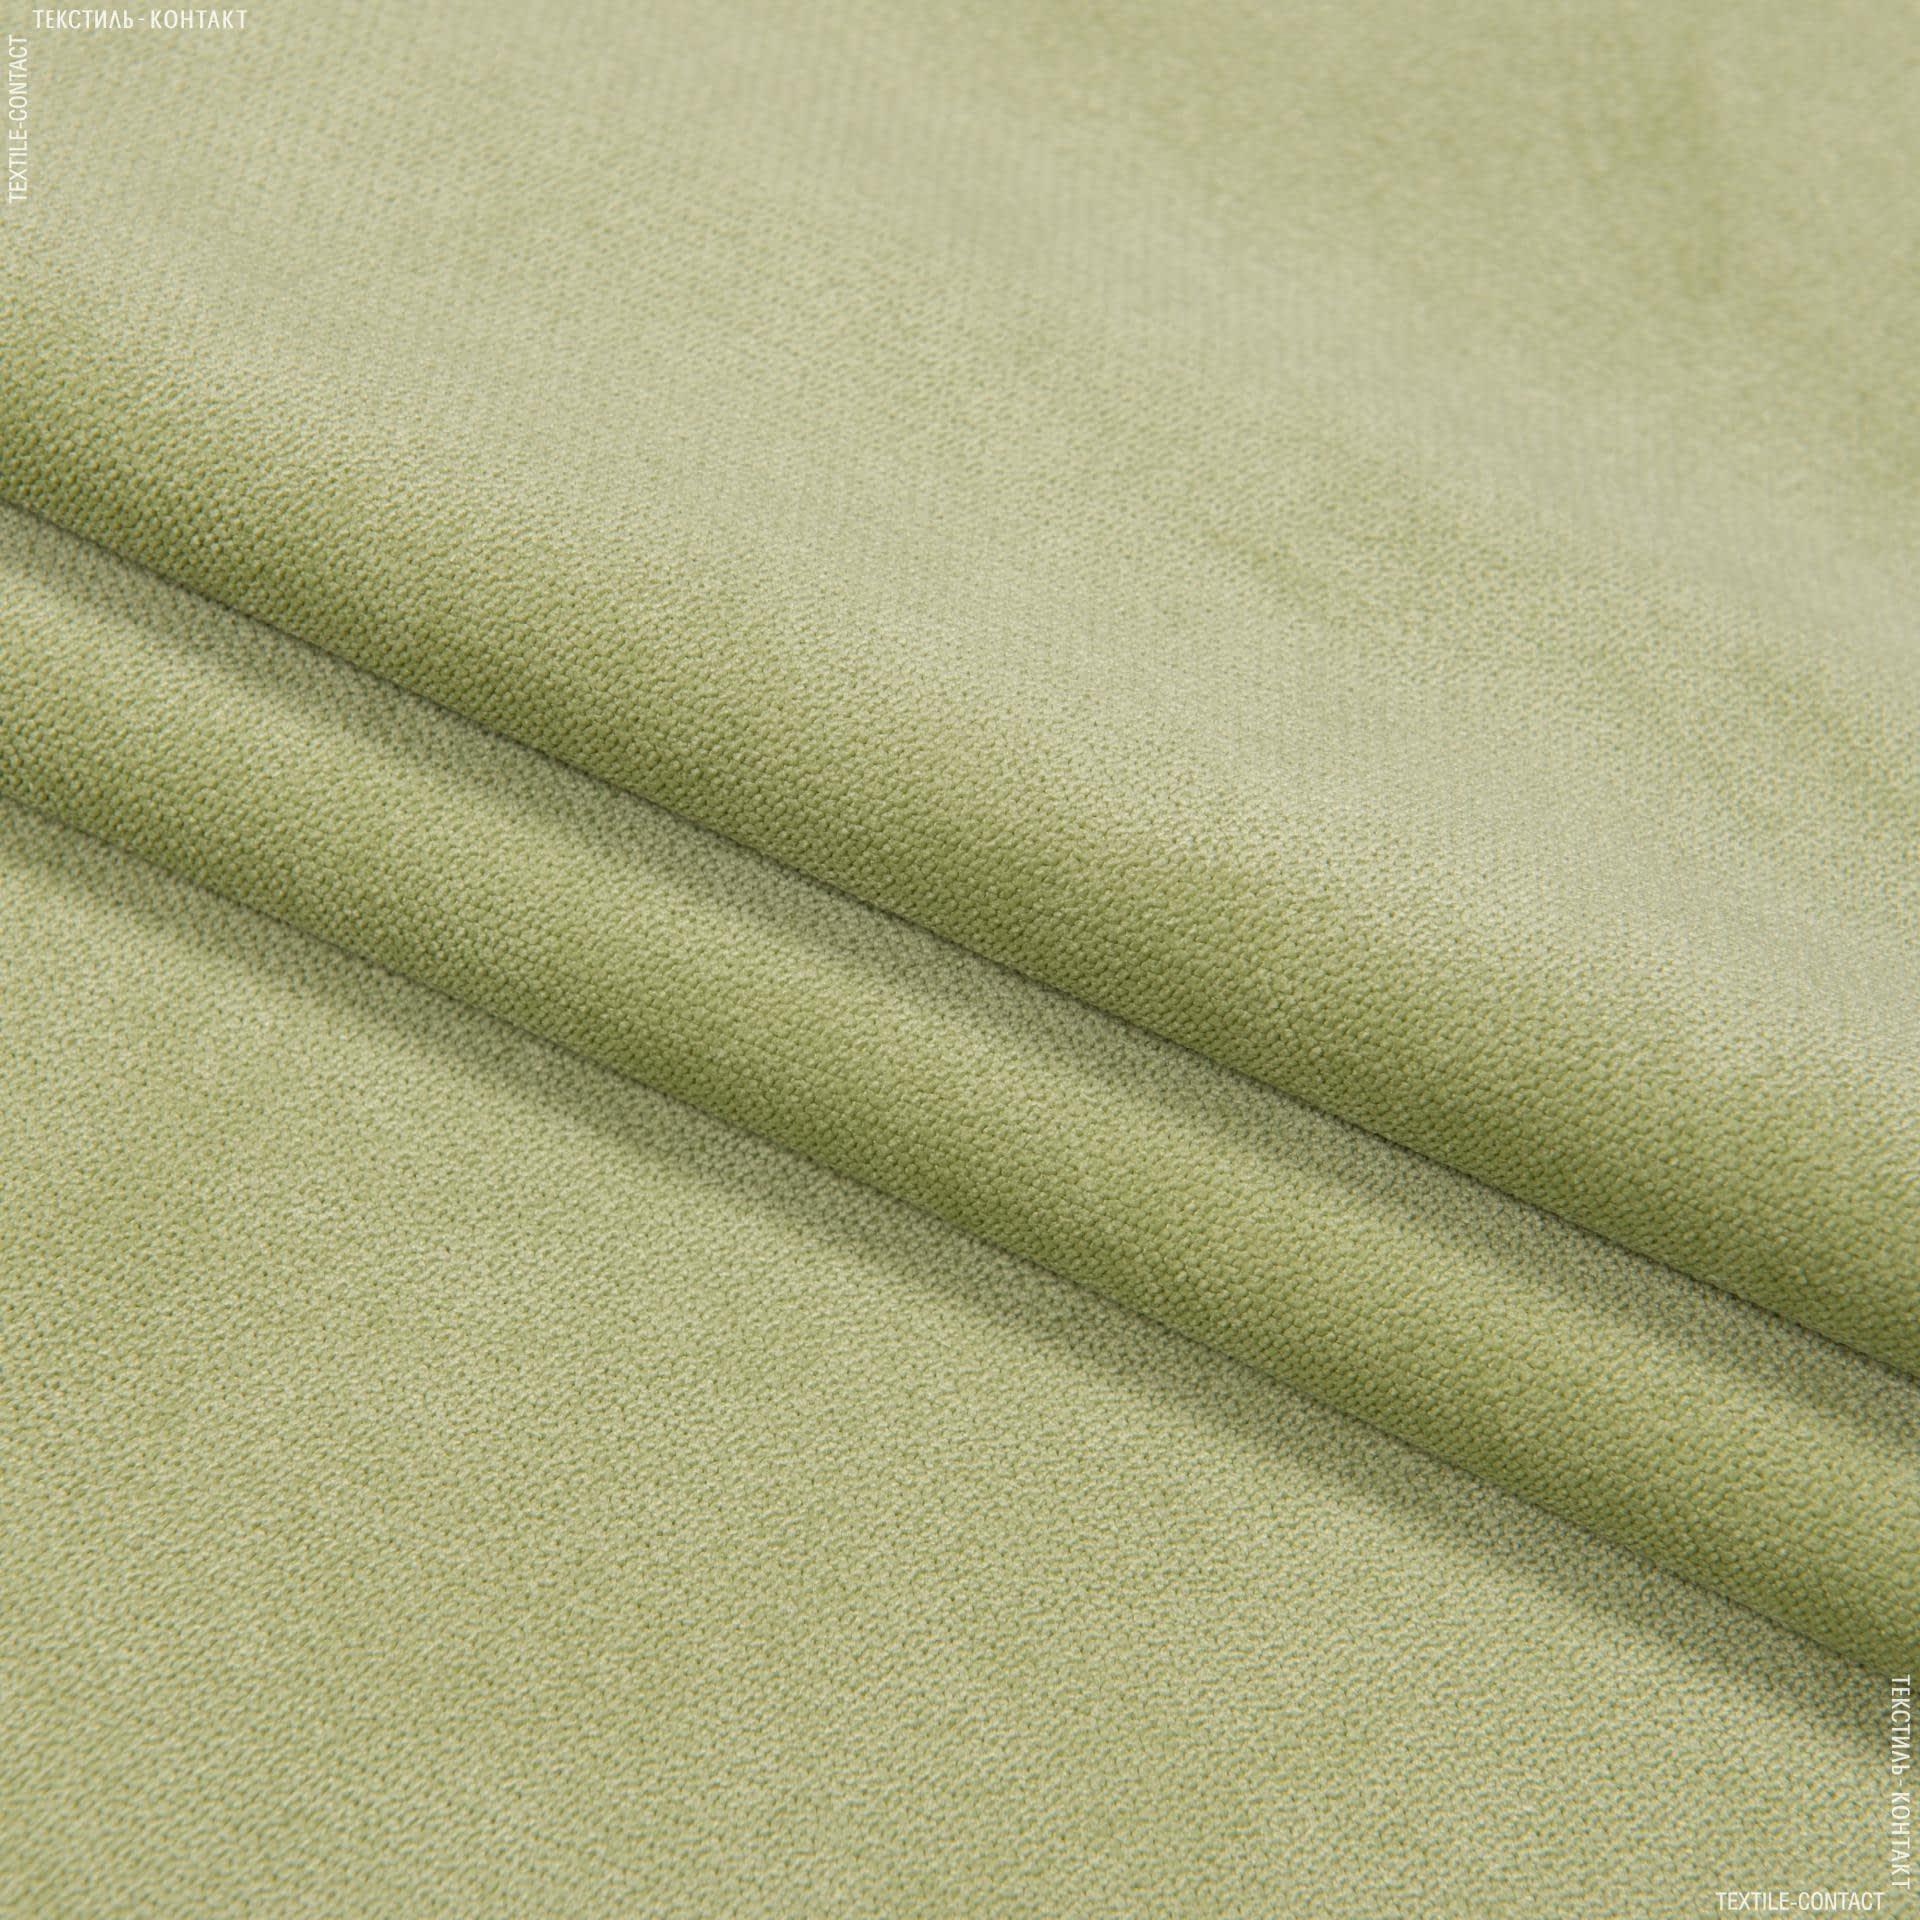 Тканини для меблів - Велюр будапешт/budapest зелене яблуко